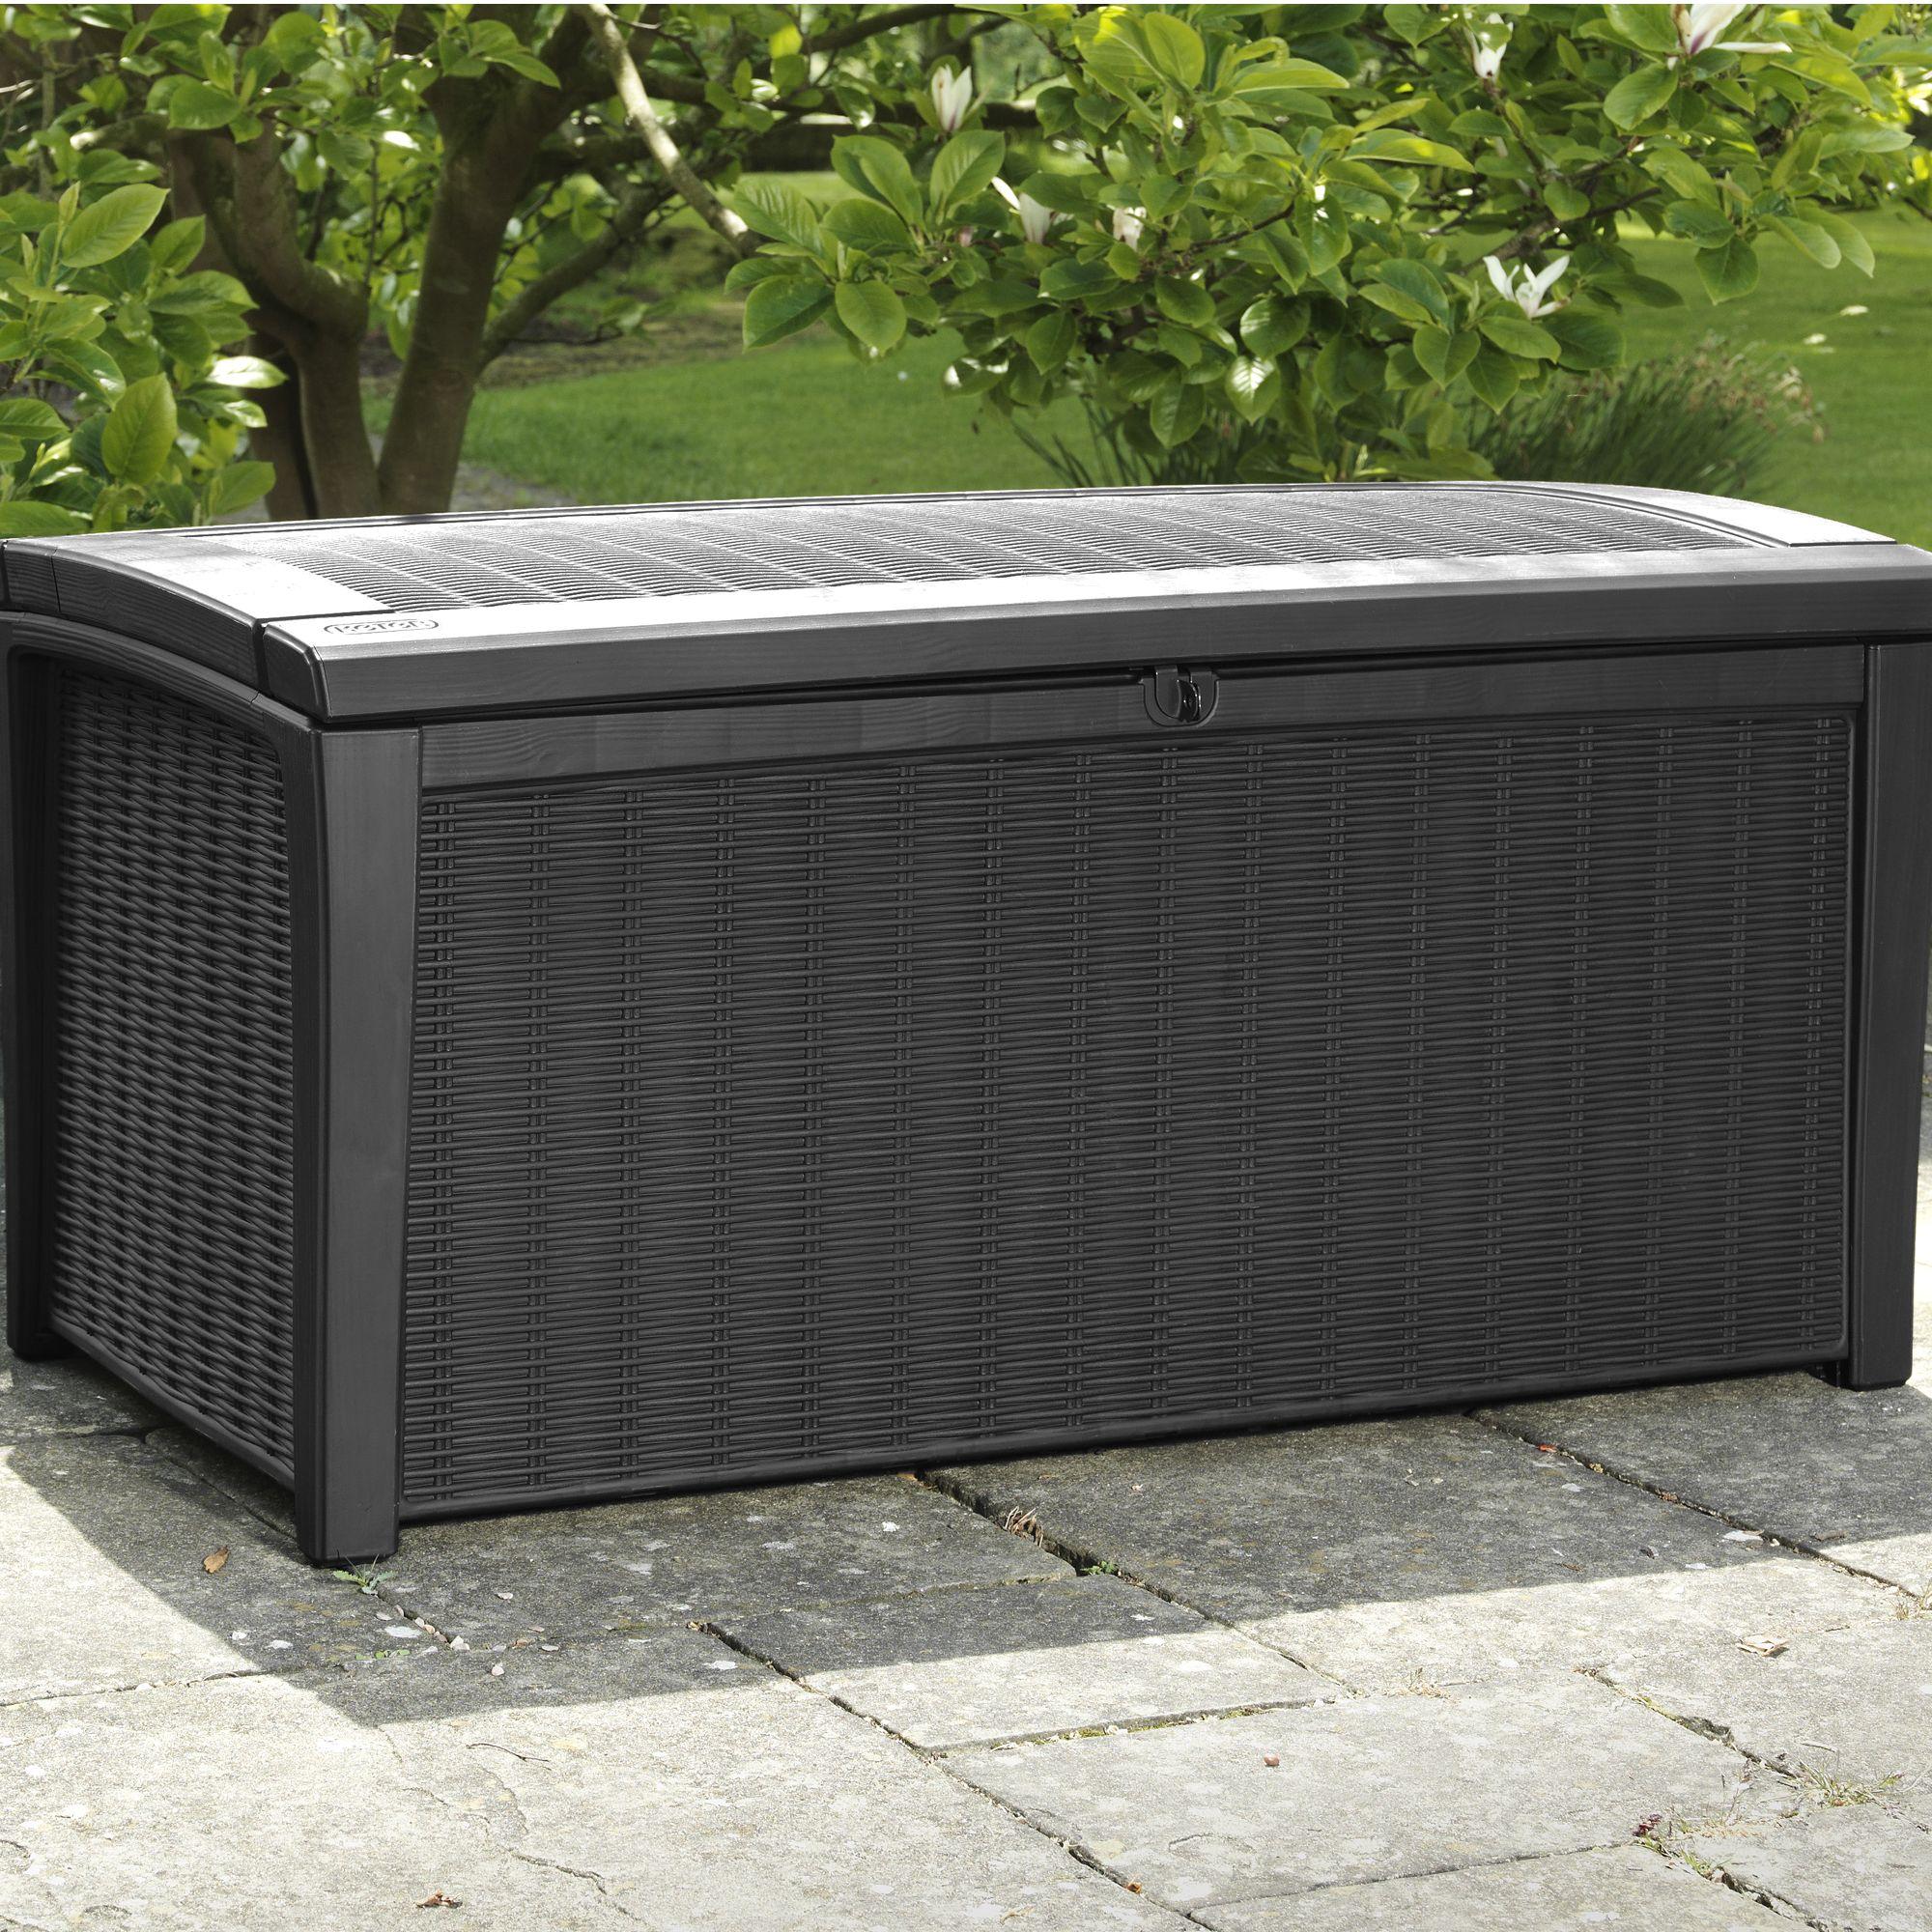 outdoor storage boxes plastic. borneo rattan effect plastic garden storage box outdoor boxes 3